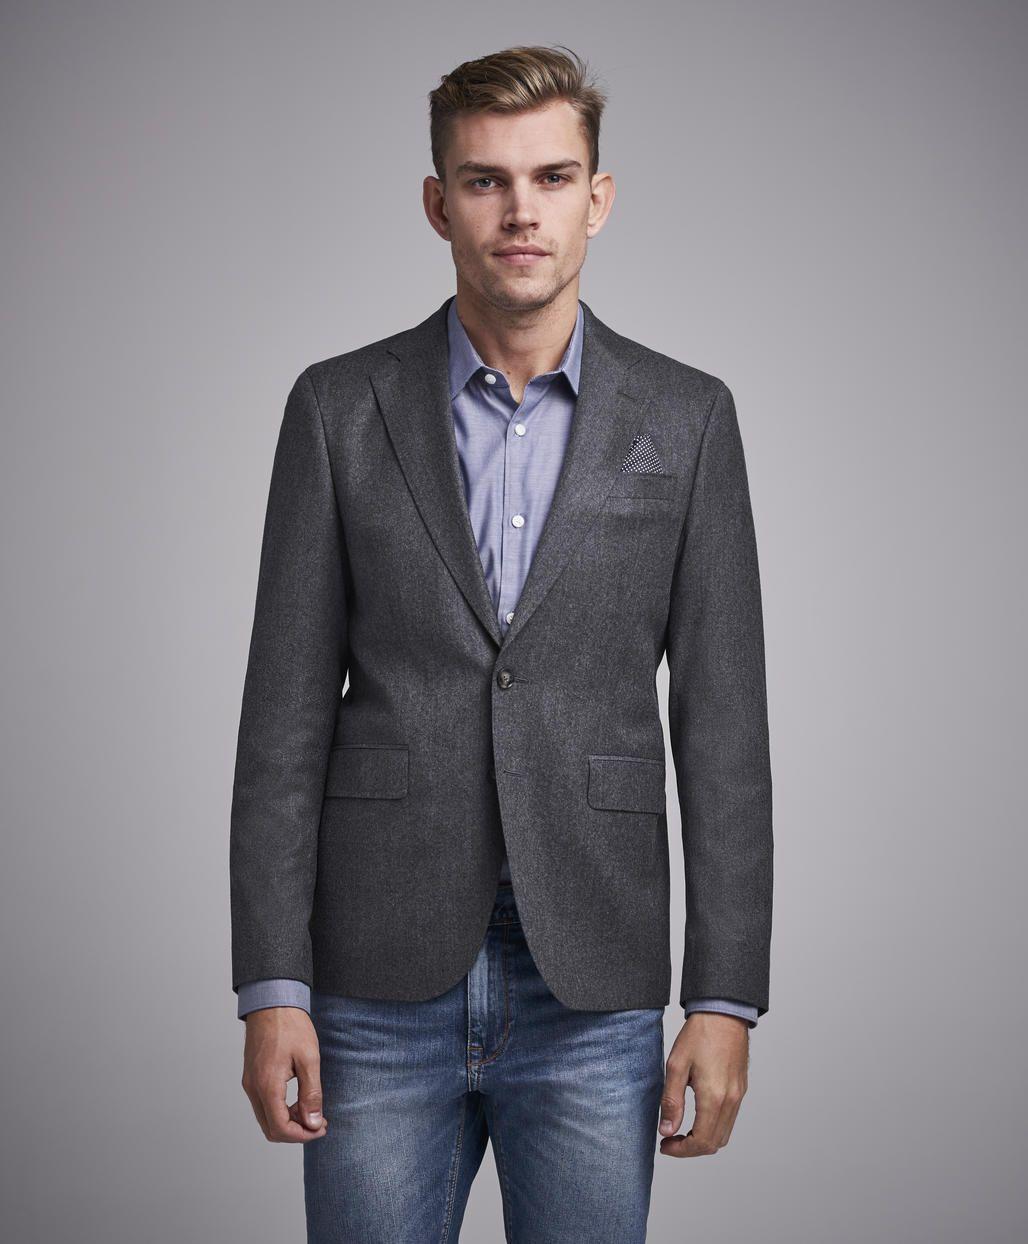 e332f373 Star Napoli 170 Mid Grey | Fashion | Klær, Grå og Dressjakke